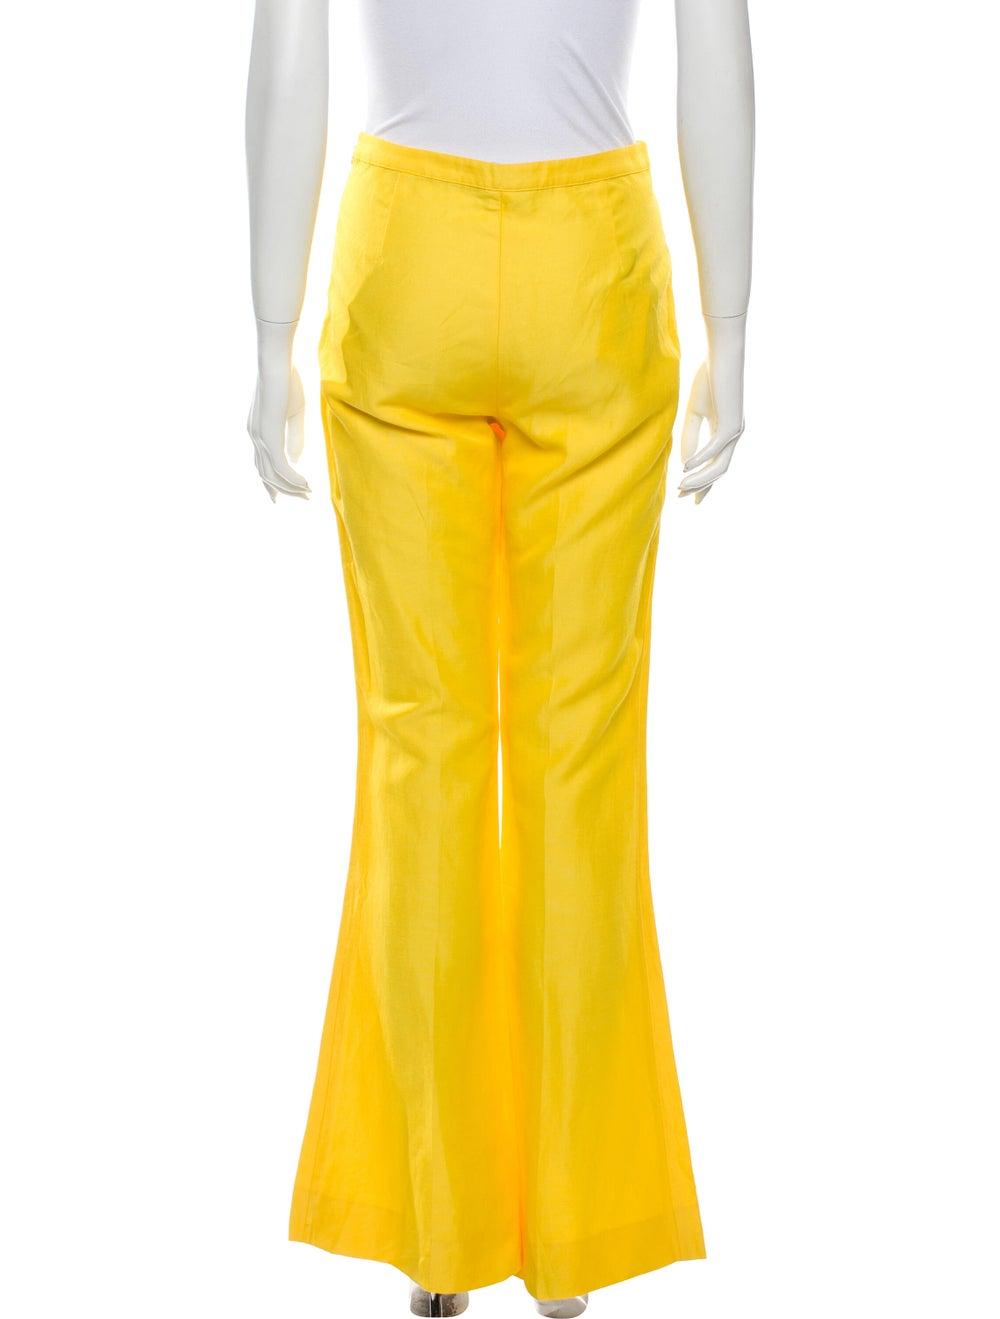 Mansur Gavriel Flared Pants Yellow - image 3